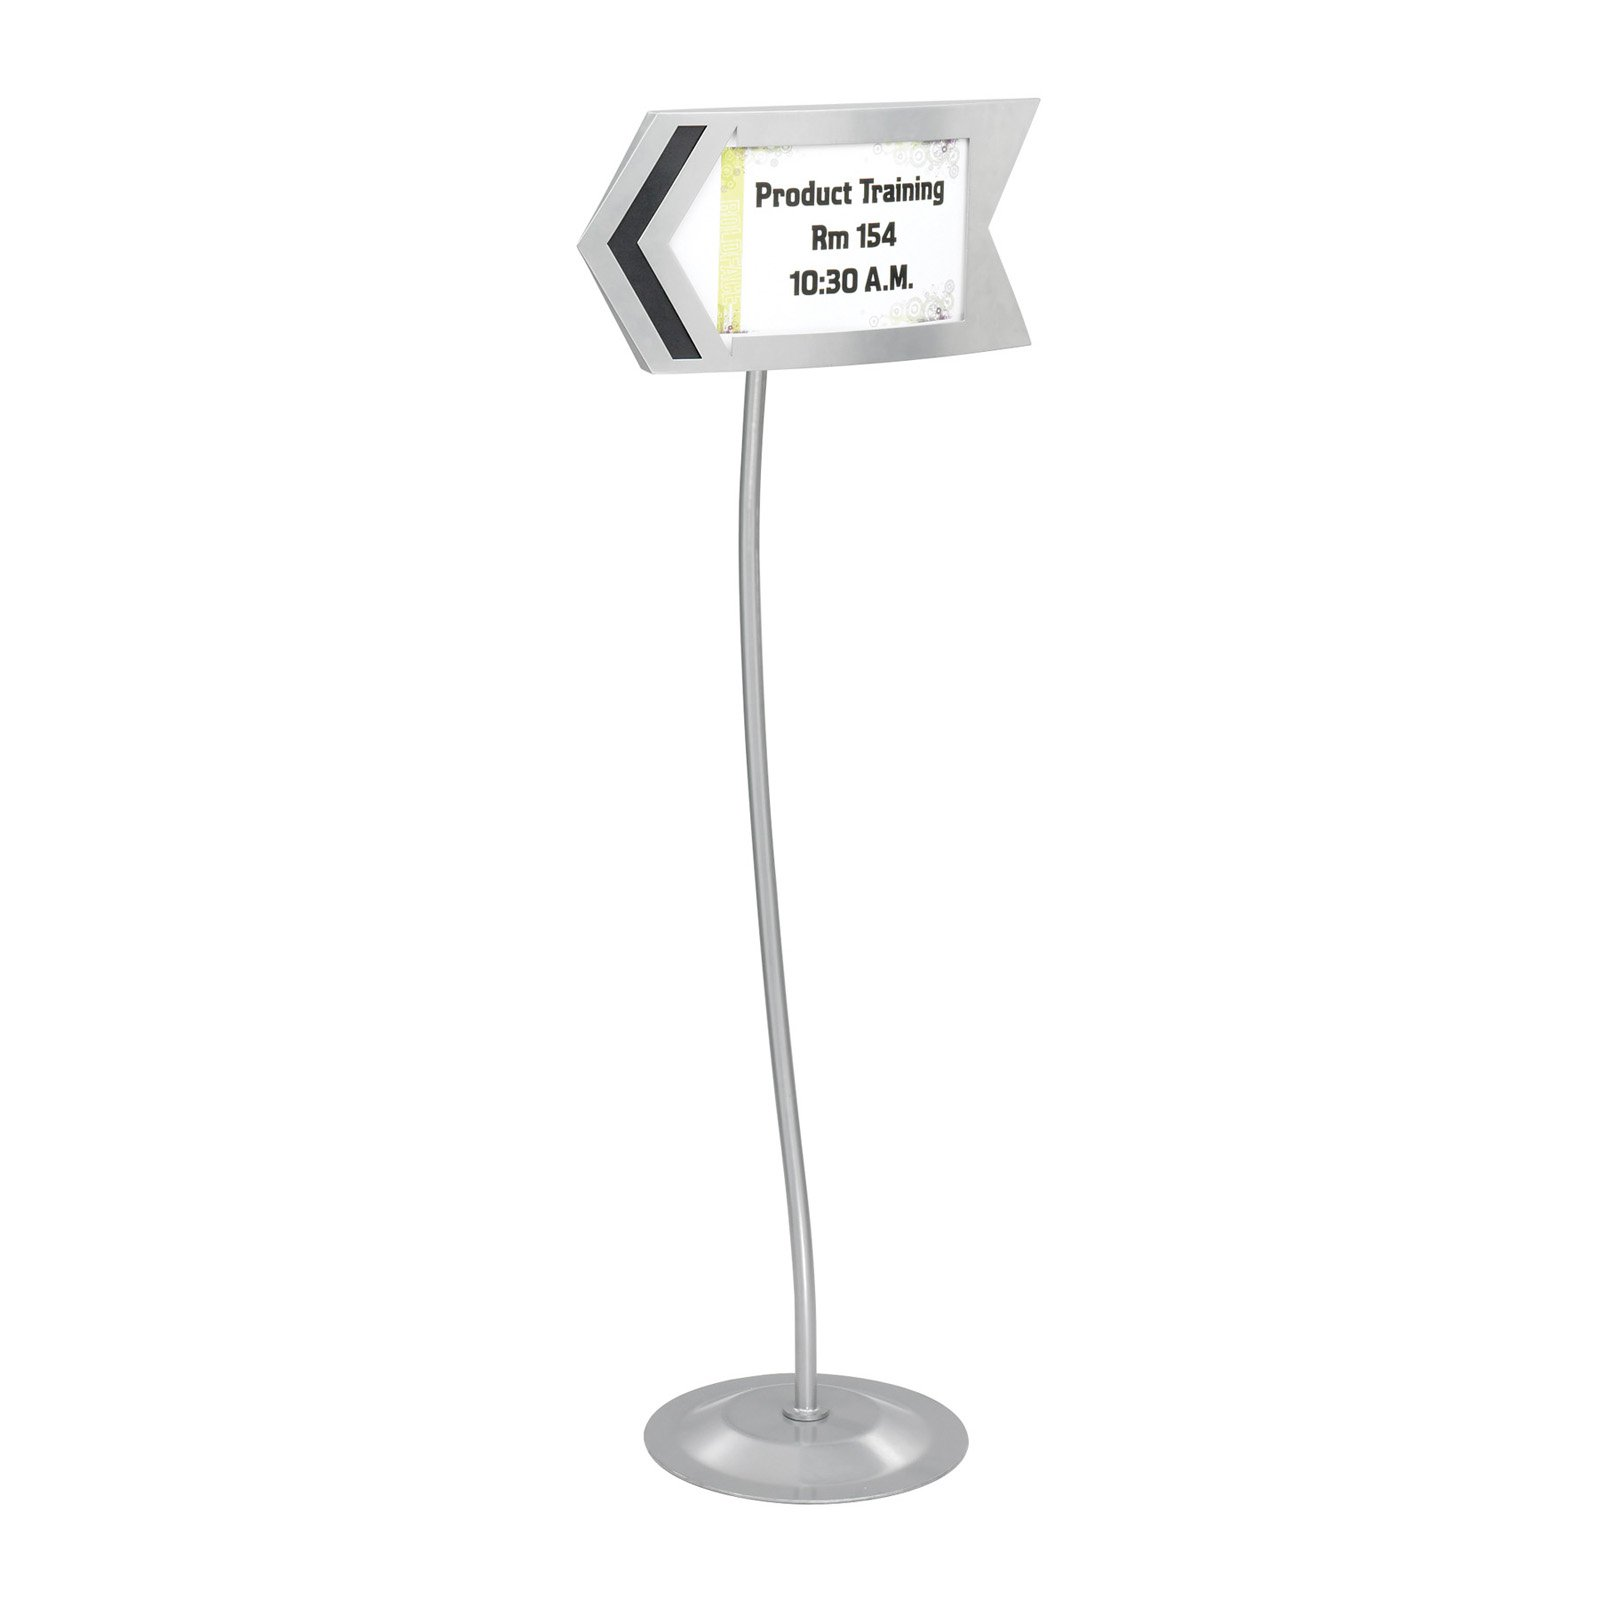 Safco Customizable Arrow Signs